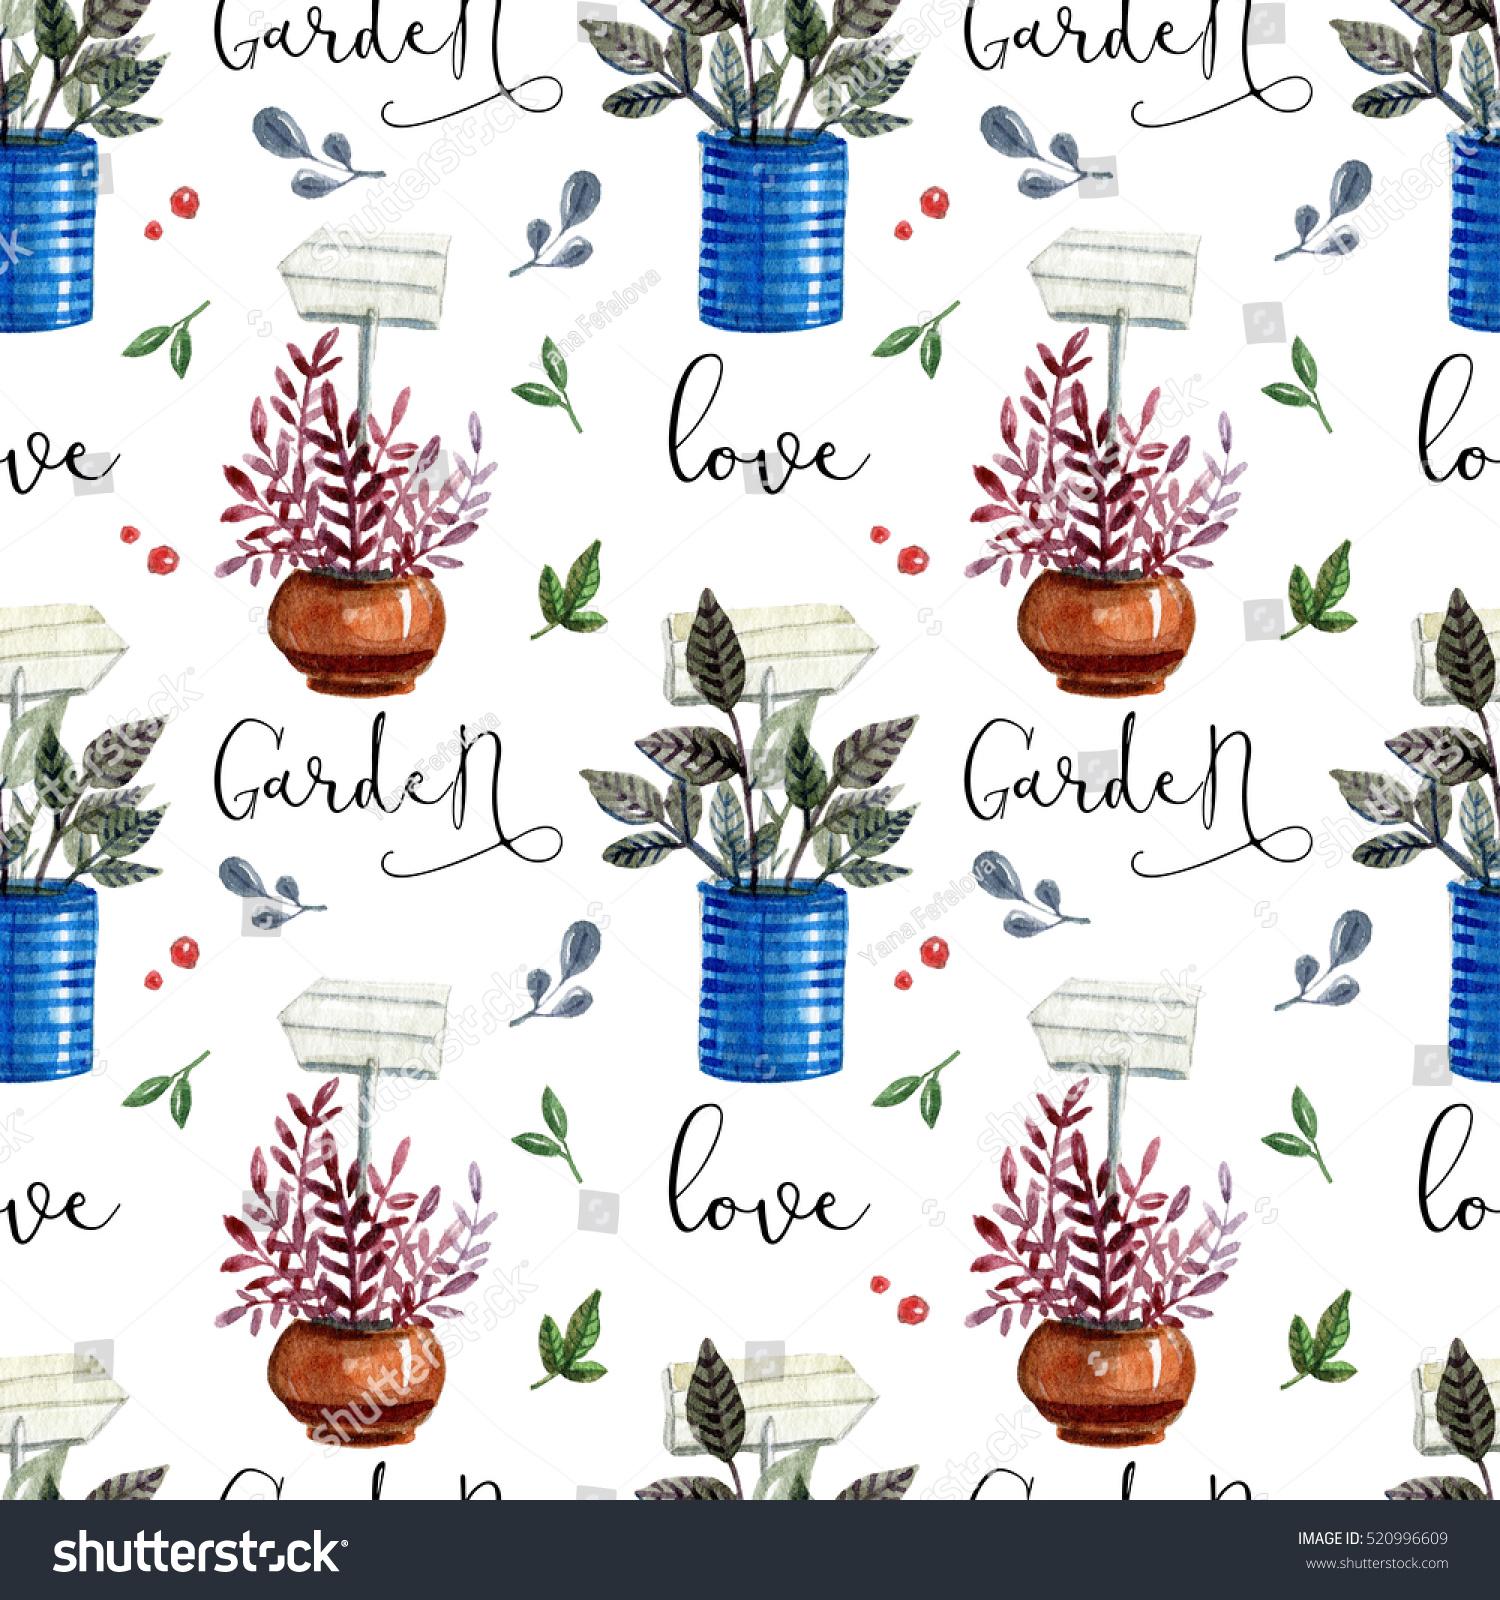 Watercolor Pattern Flower Potslove Home Gardenwatercolor Stock ...